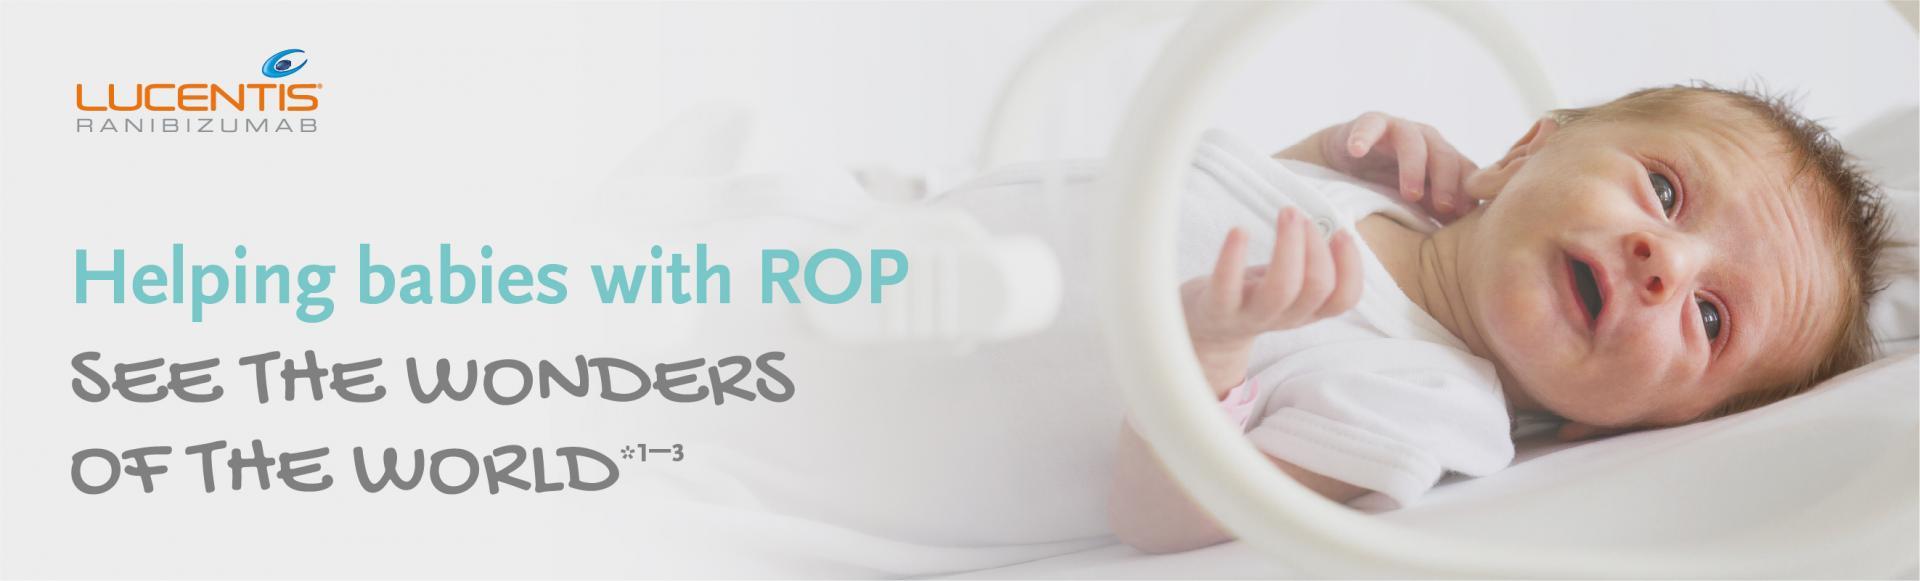 lucentis-rop-banner